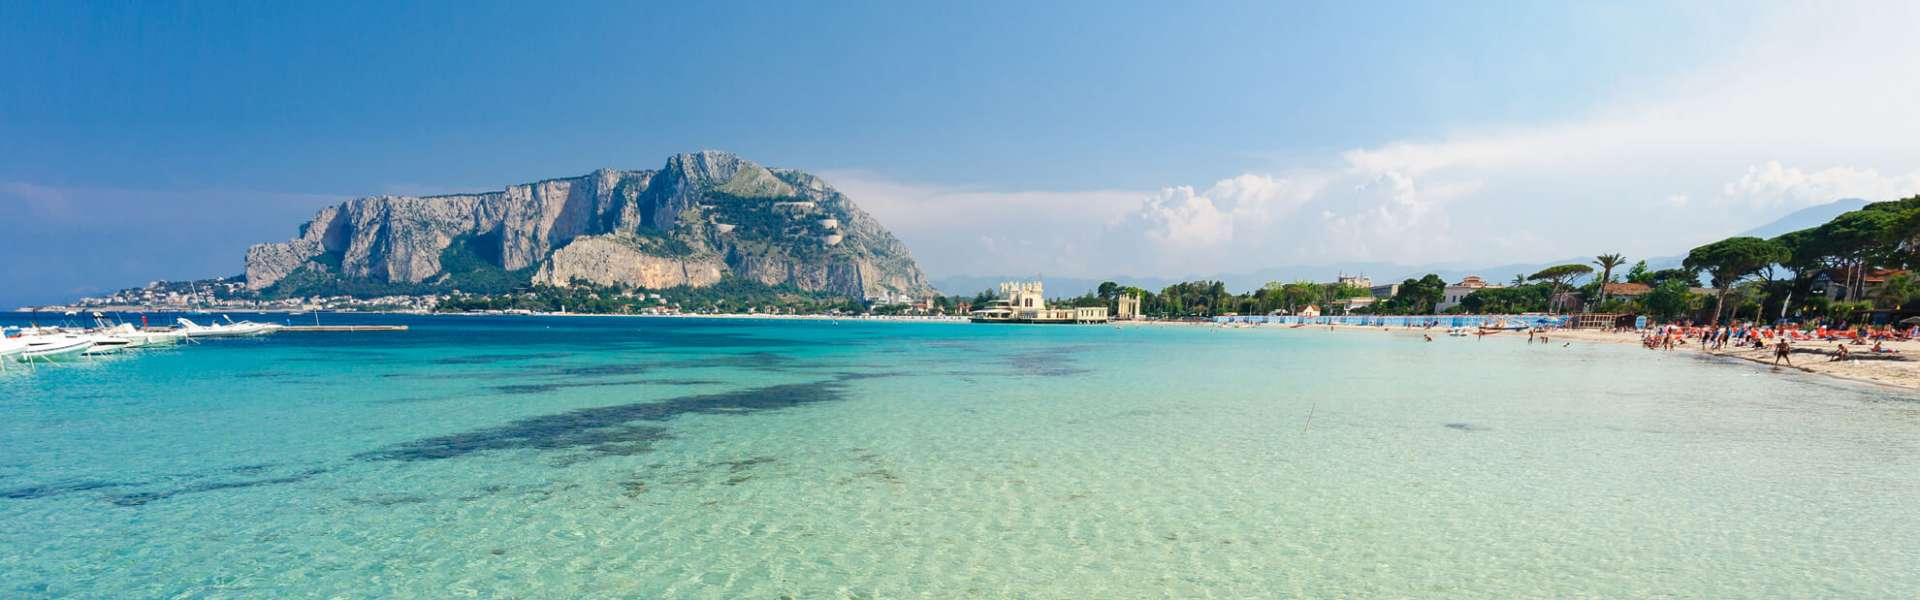 Singlereis Sicilië